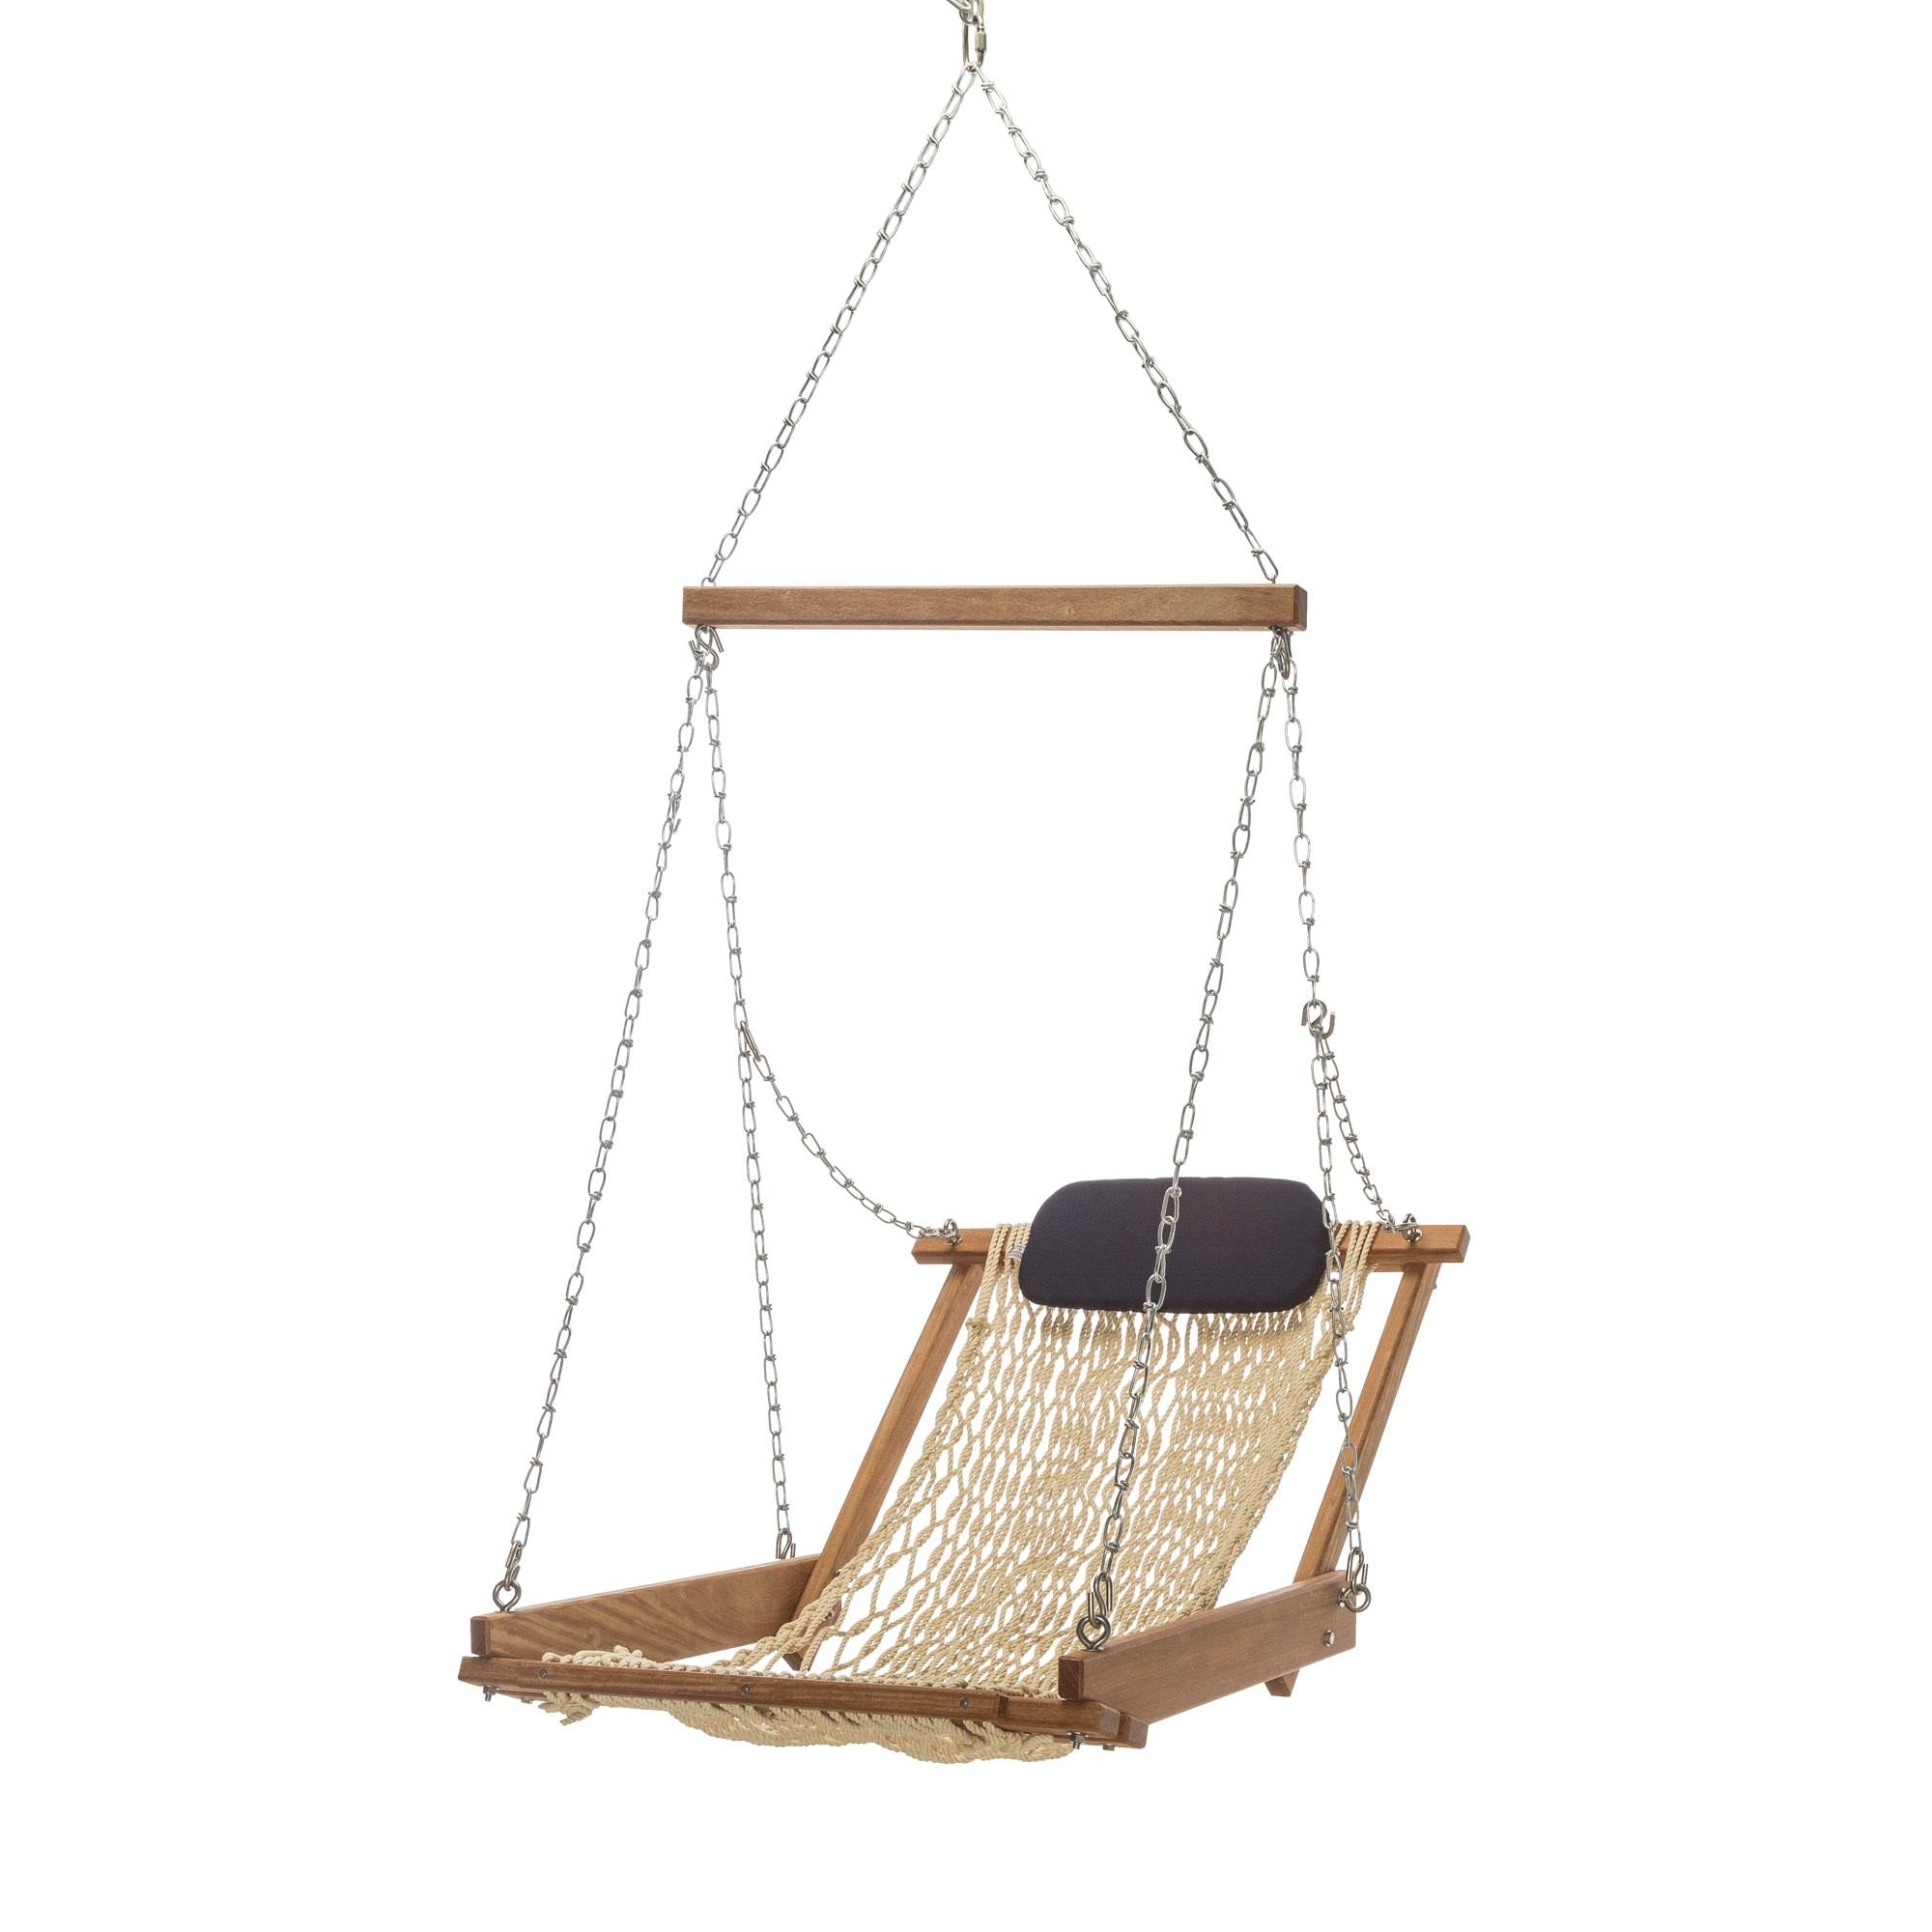 Cumaru Hanging Hammock Chair Nags Head Hammocks